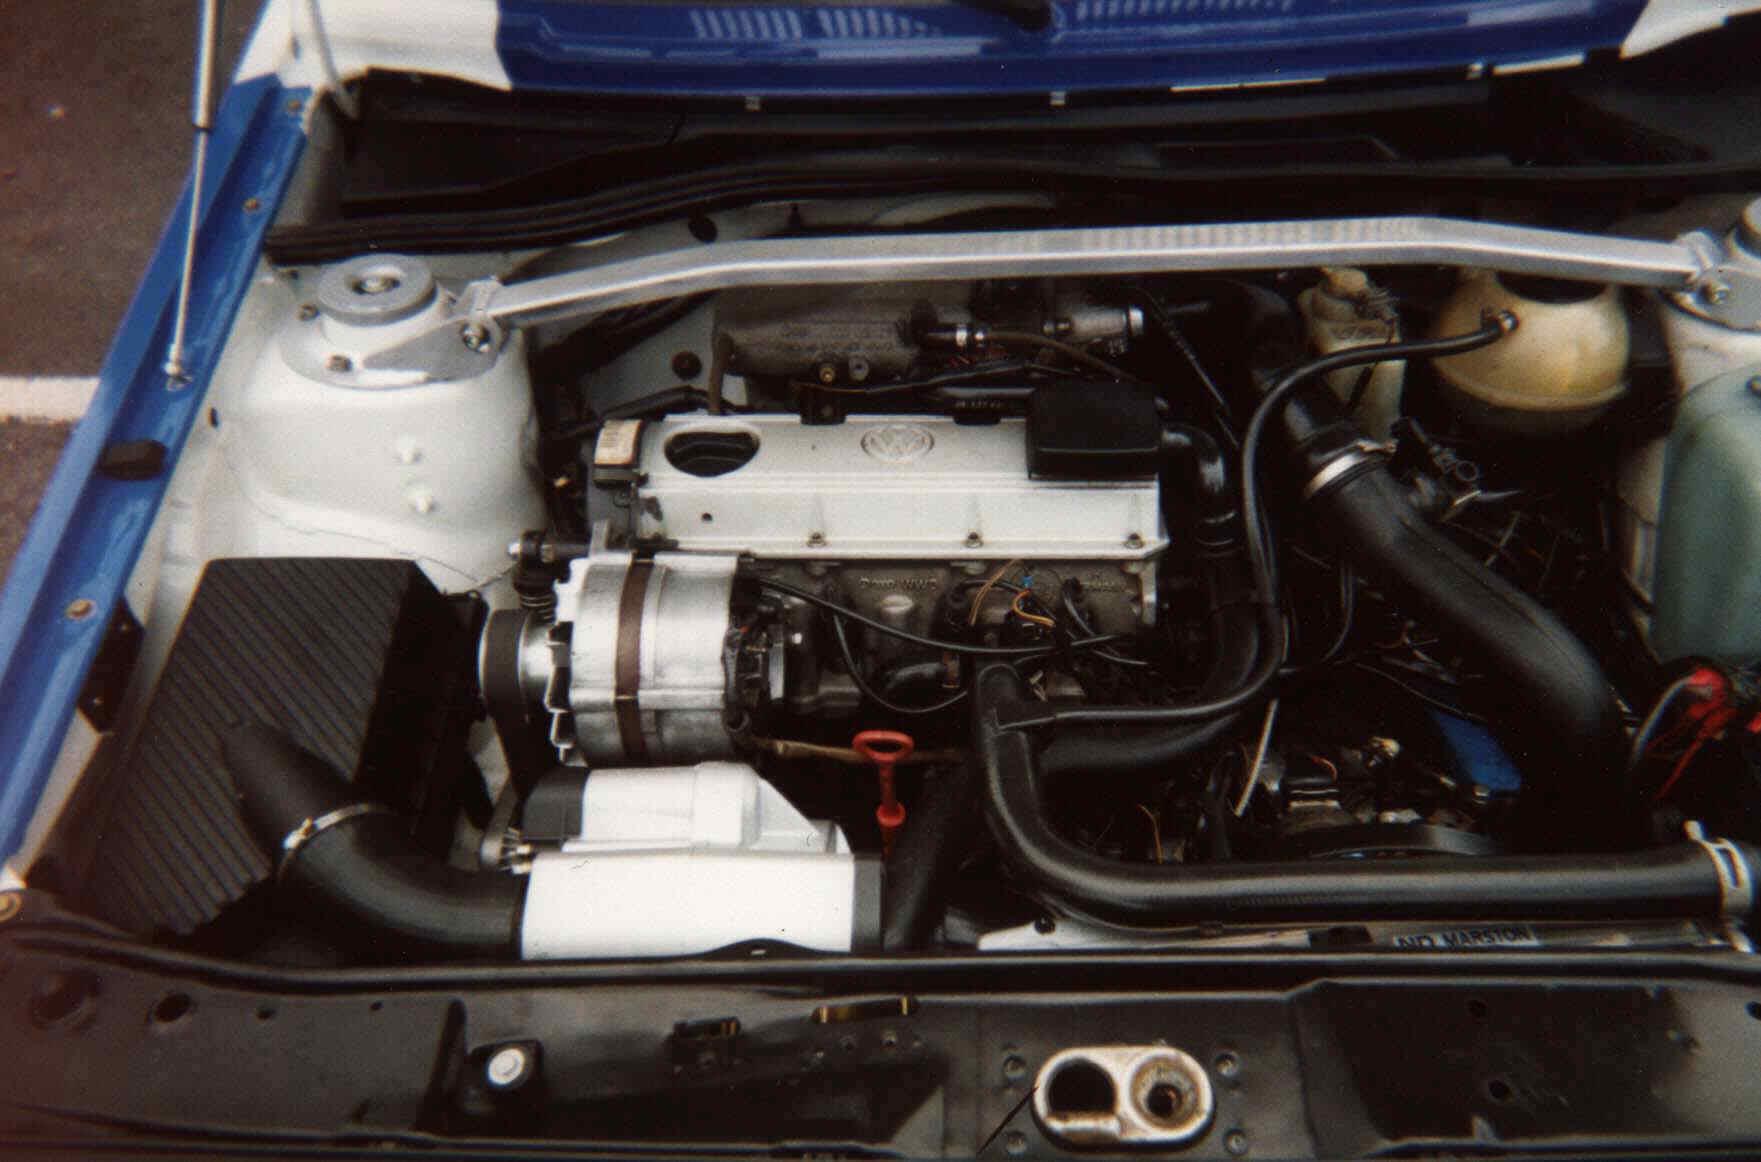 G60 G 60 Compresseur G60 G 60 Corrado G60 G40